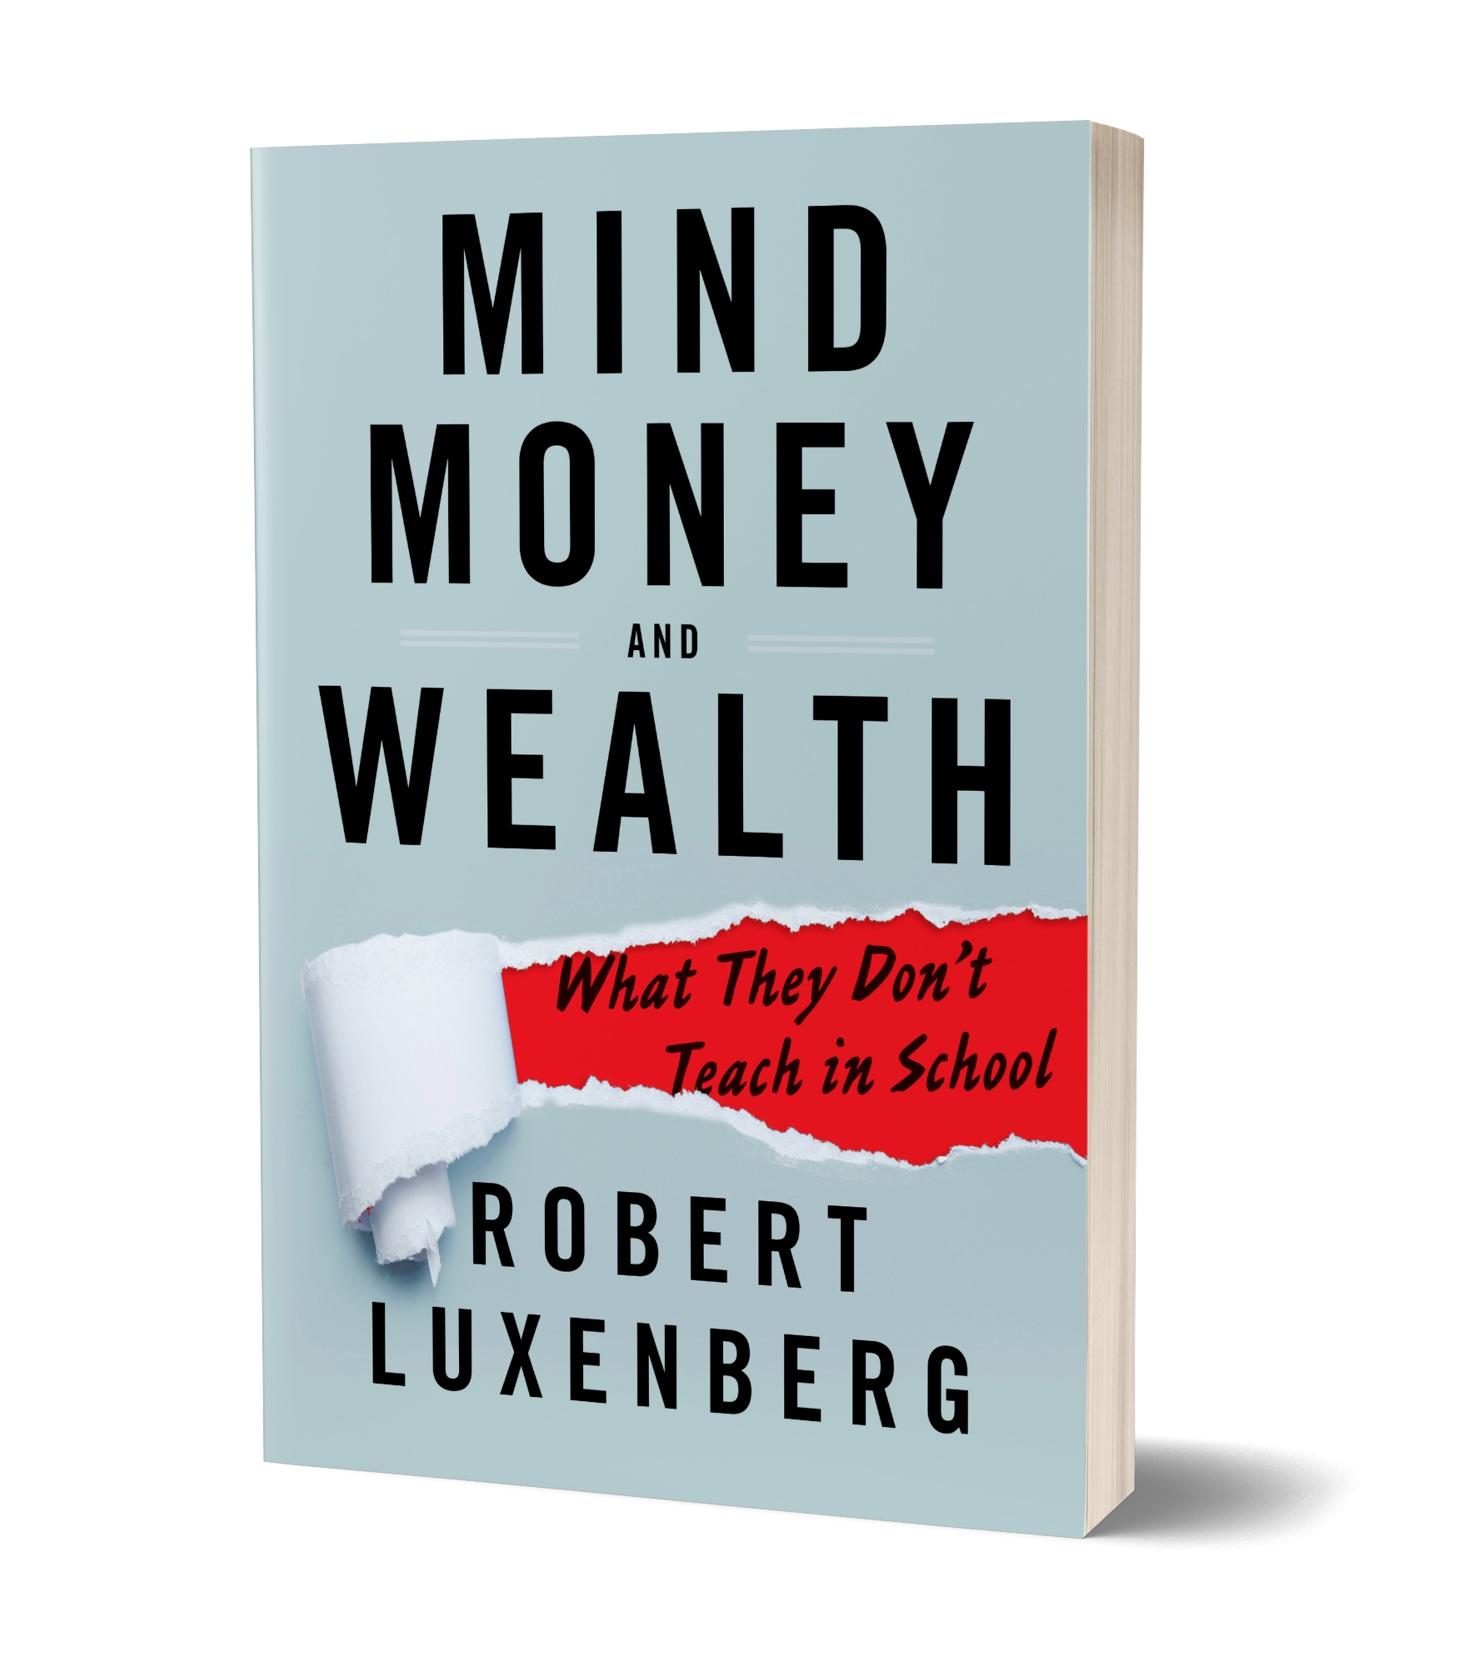 Mind+Money+Wealth+3D+Transparent.jpg